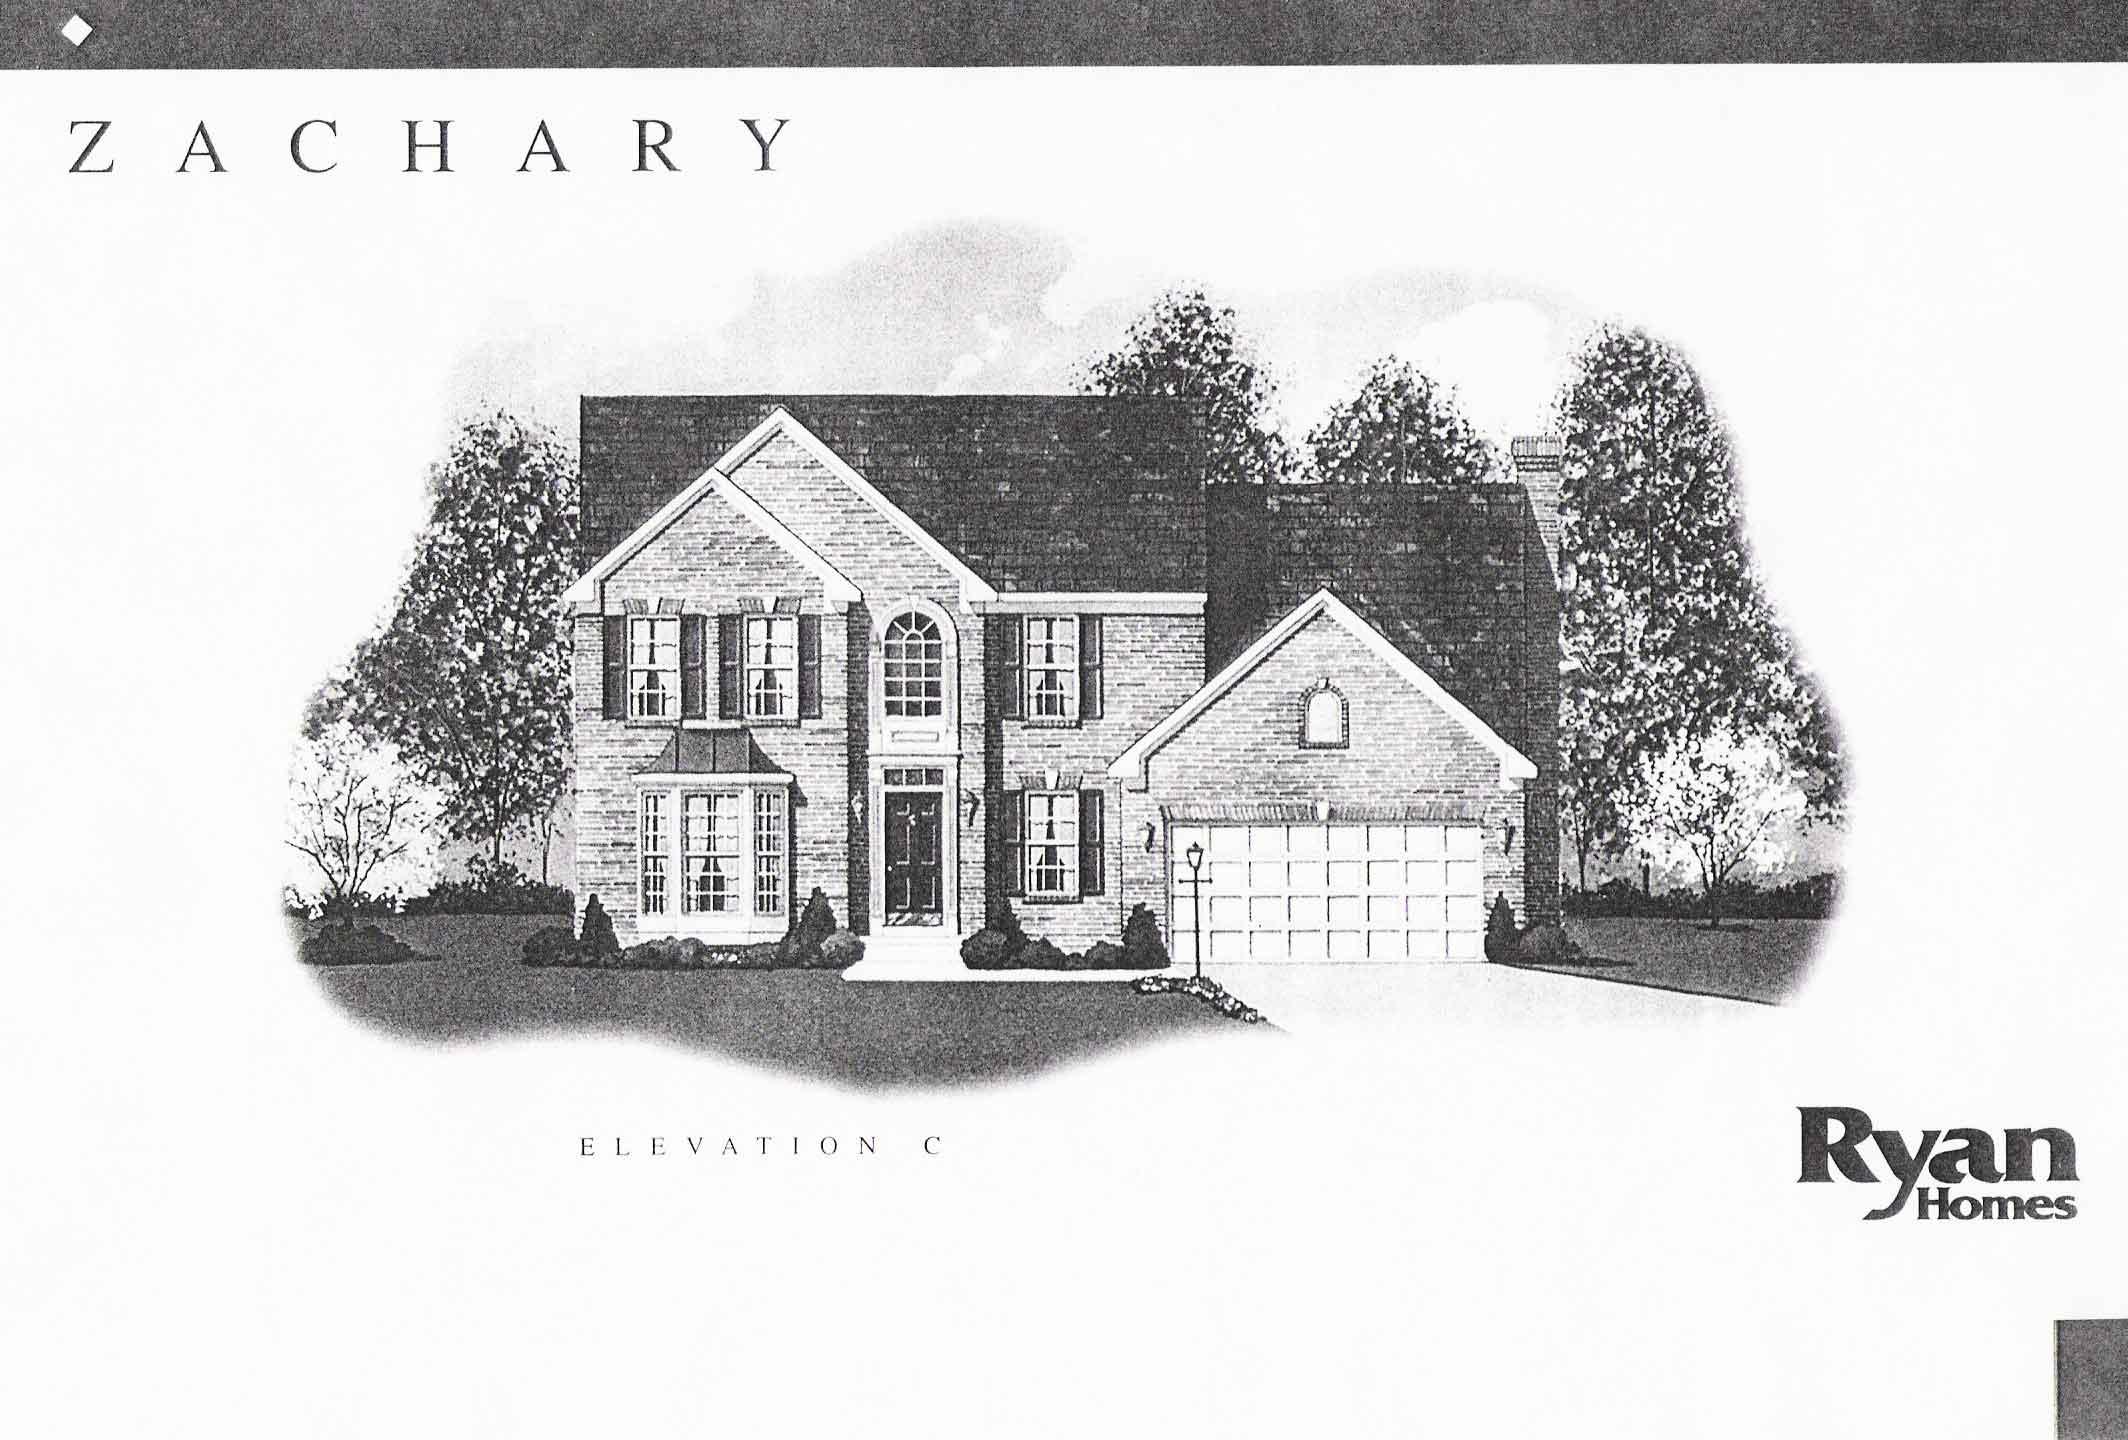 Ryan homes zachary place floor plan House design plans